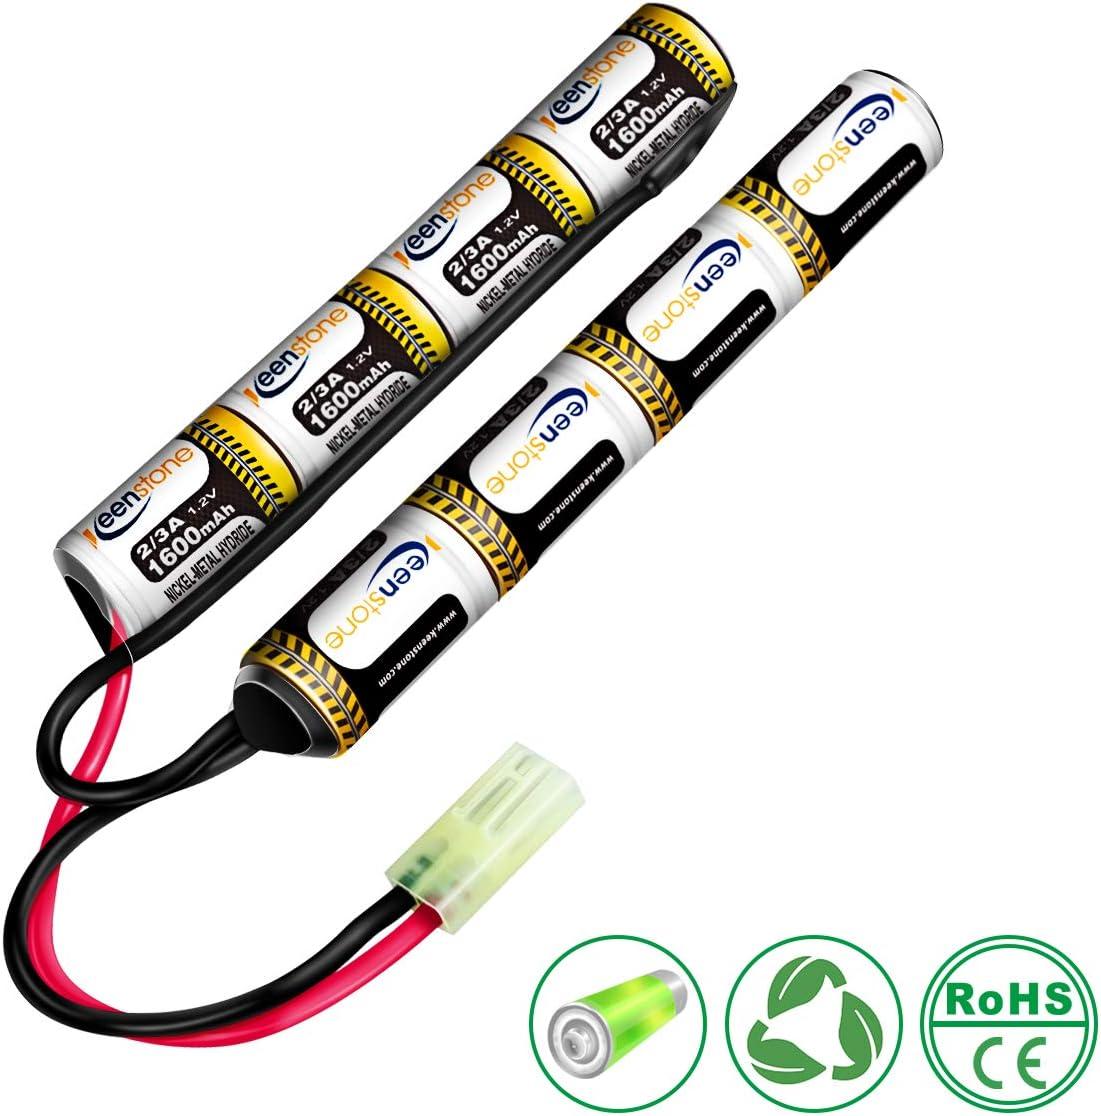 Keenstone Baterías Airsoft Stick NiMH 9.6V 1600mAh Nunchuk Stick para Rifle de Aire ICS CA TM SRC JG G36 G y M734, etc. + Mini Conector Tamiya High Discharge